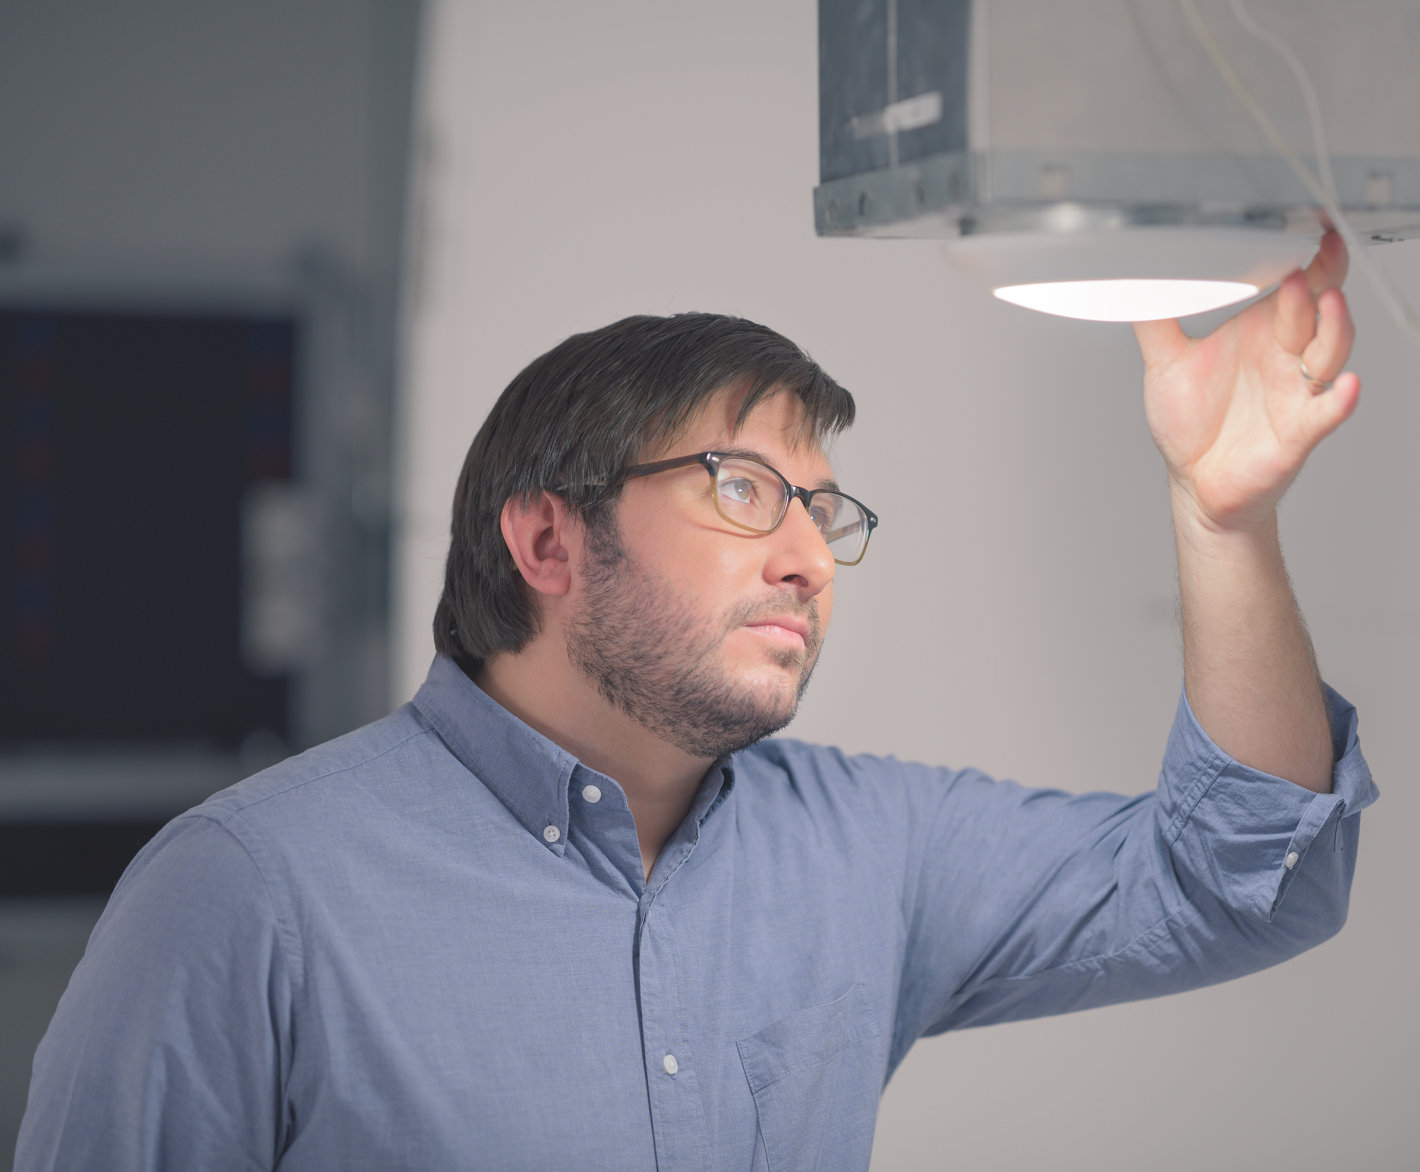 Luminaire manufacturers